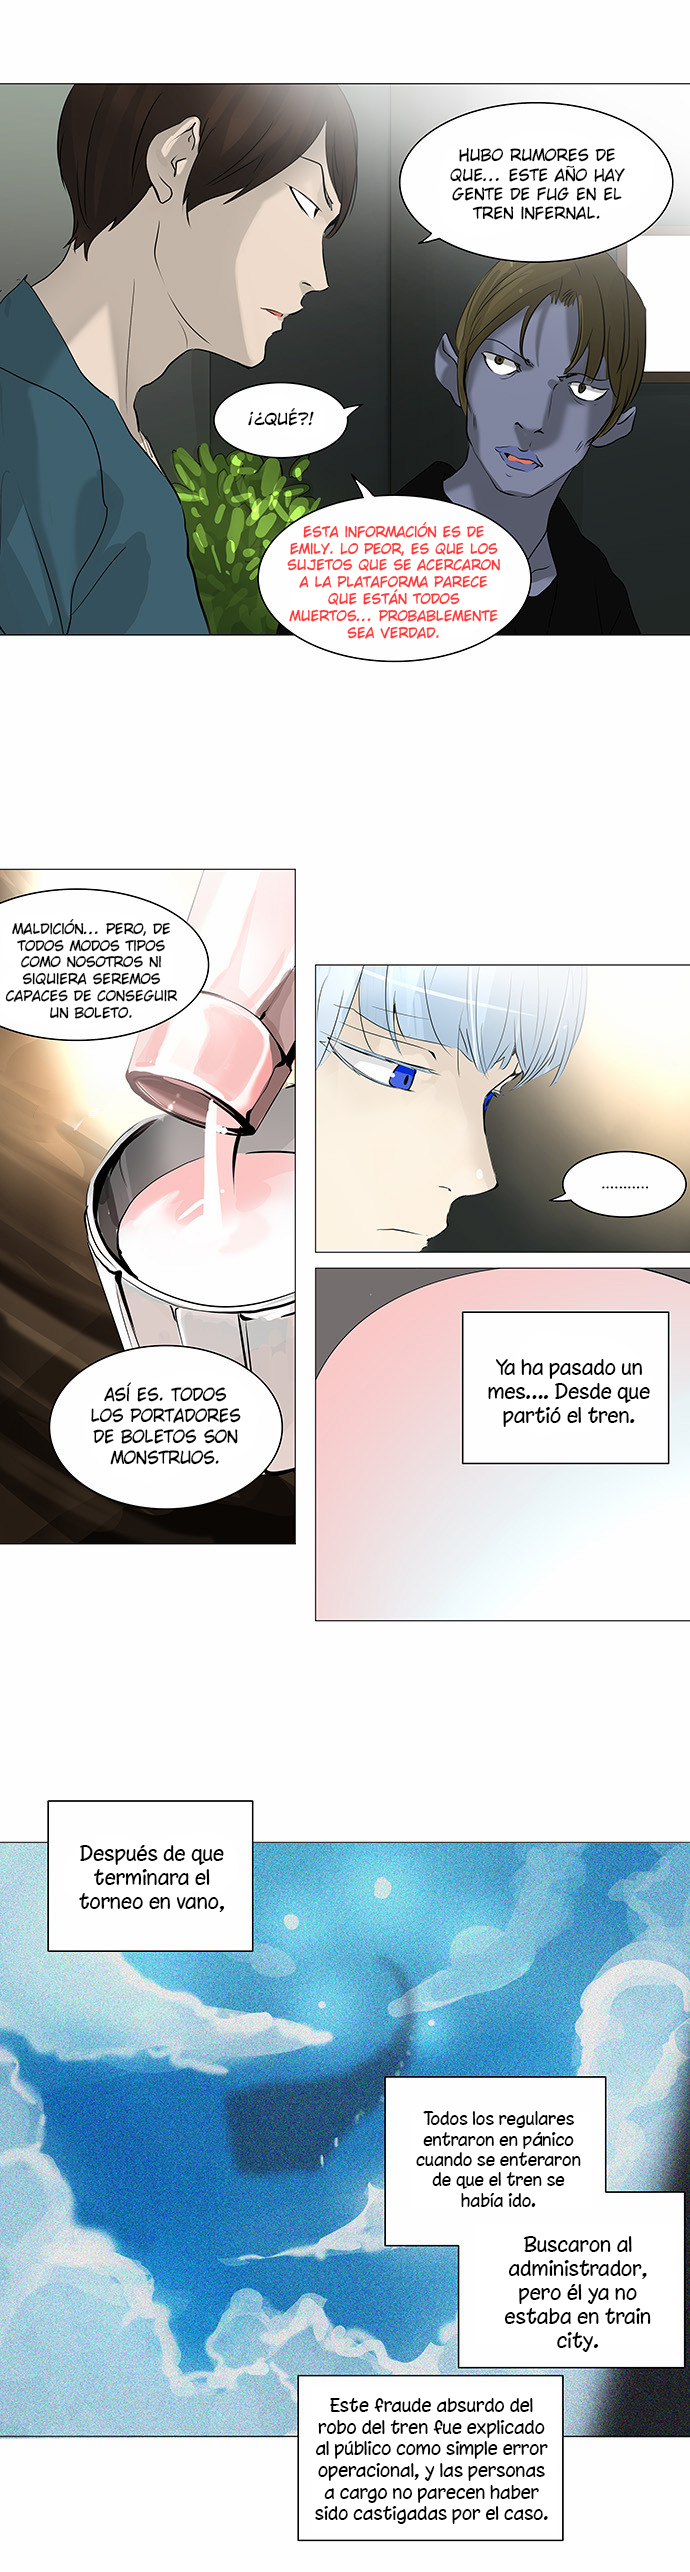 http://c5.ninemanga.com/es_manga/21/149/389211/9406eebdc772a83271bf87635d5d3a34.jpg Page 9